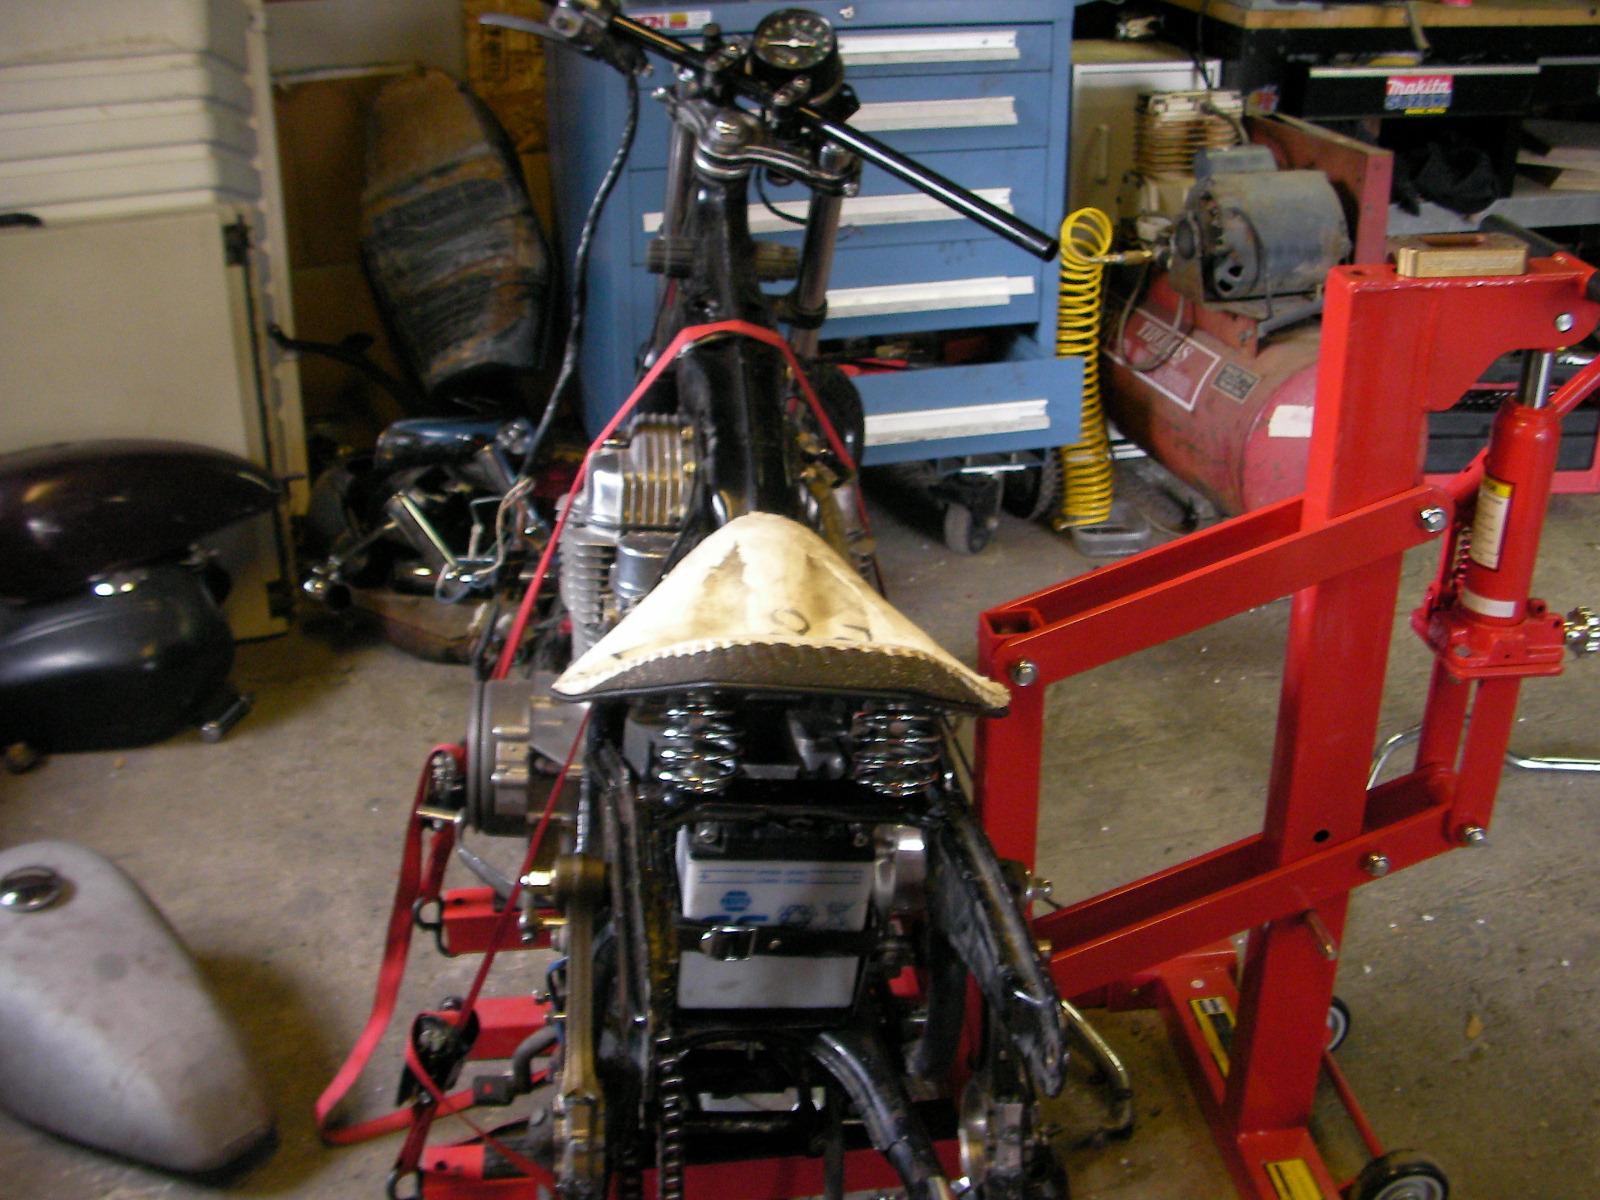 Sunpro Drag N Tach Wiring Diagram Briggs Carb Linkage Sic Figure Cycles Seat Pan Mounted